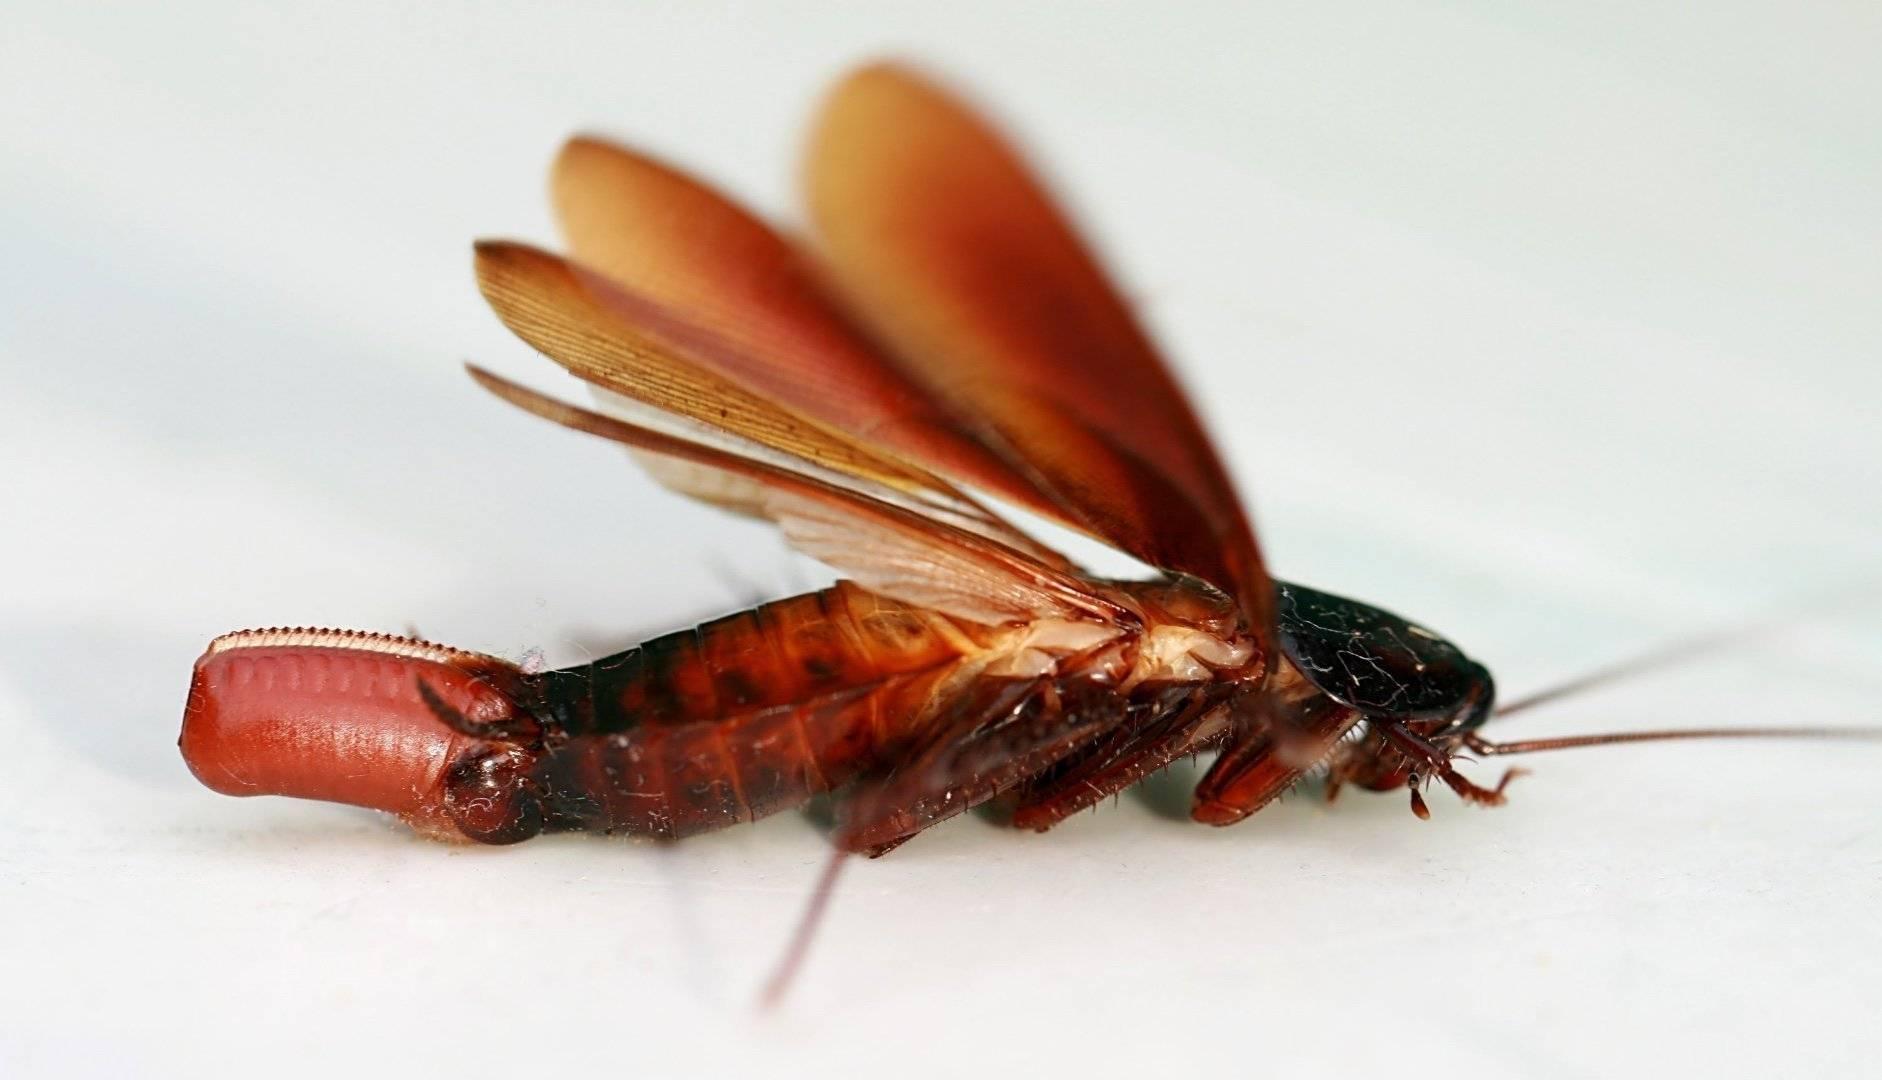 Как выглядят разновидности тараканов